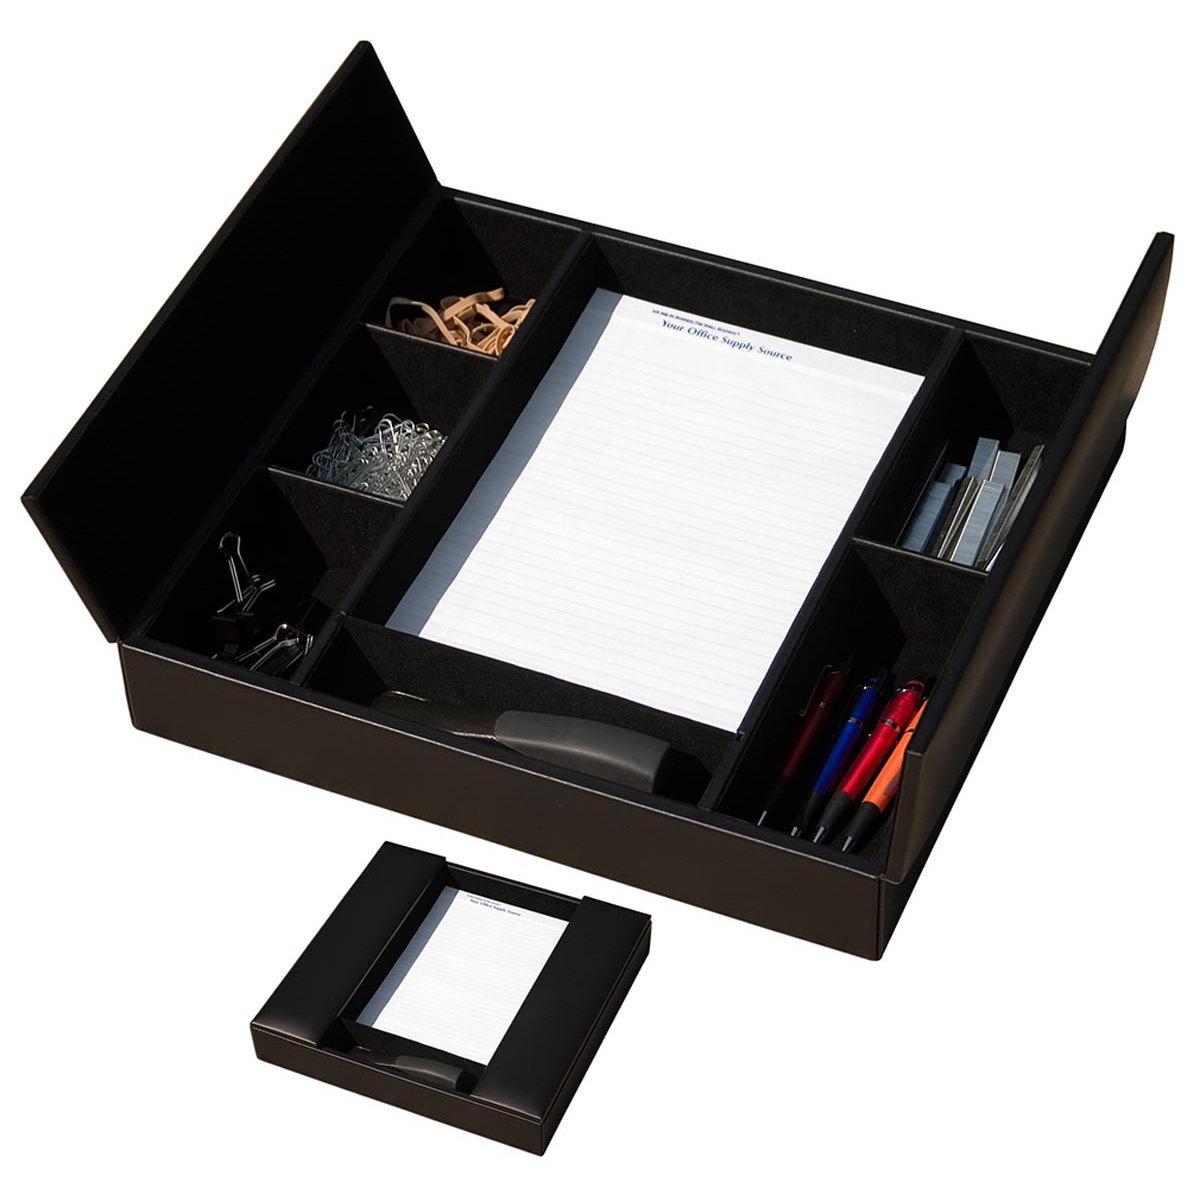 Leather desk accessories - Black Leather Conference Room Organizer Waulsruba3291